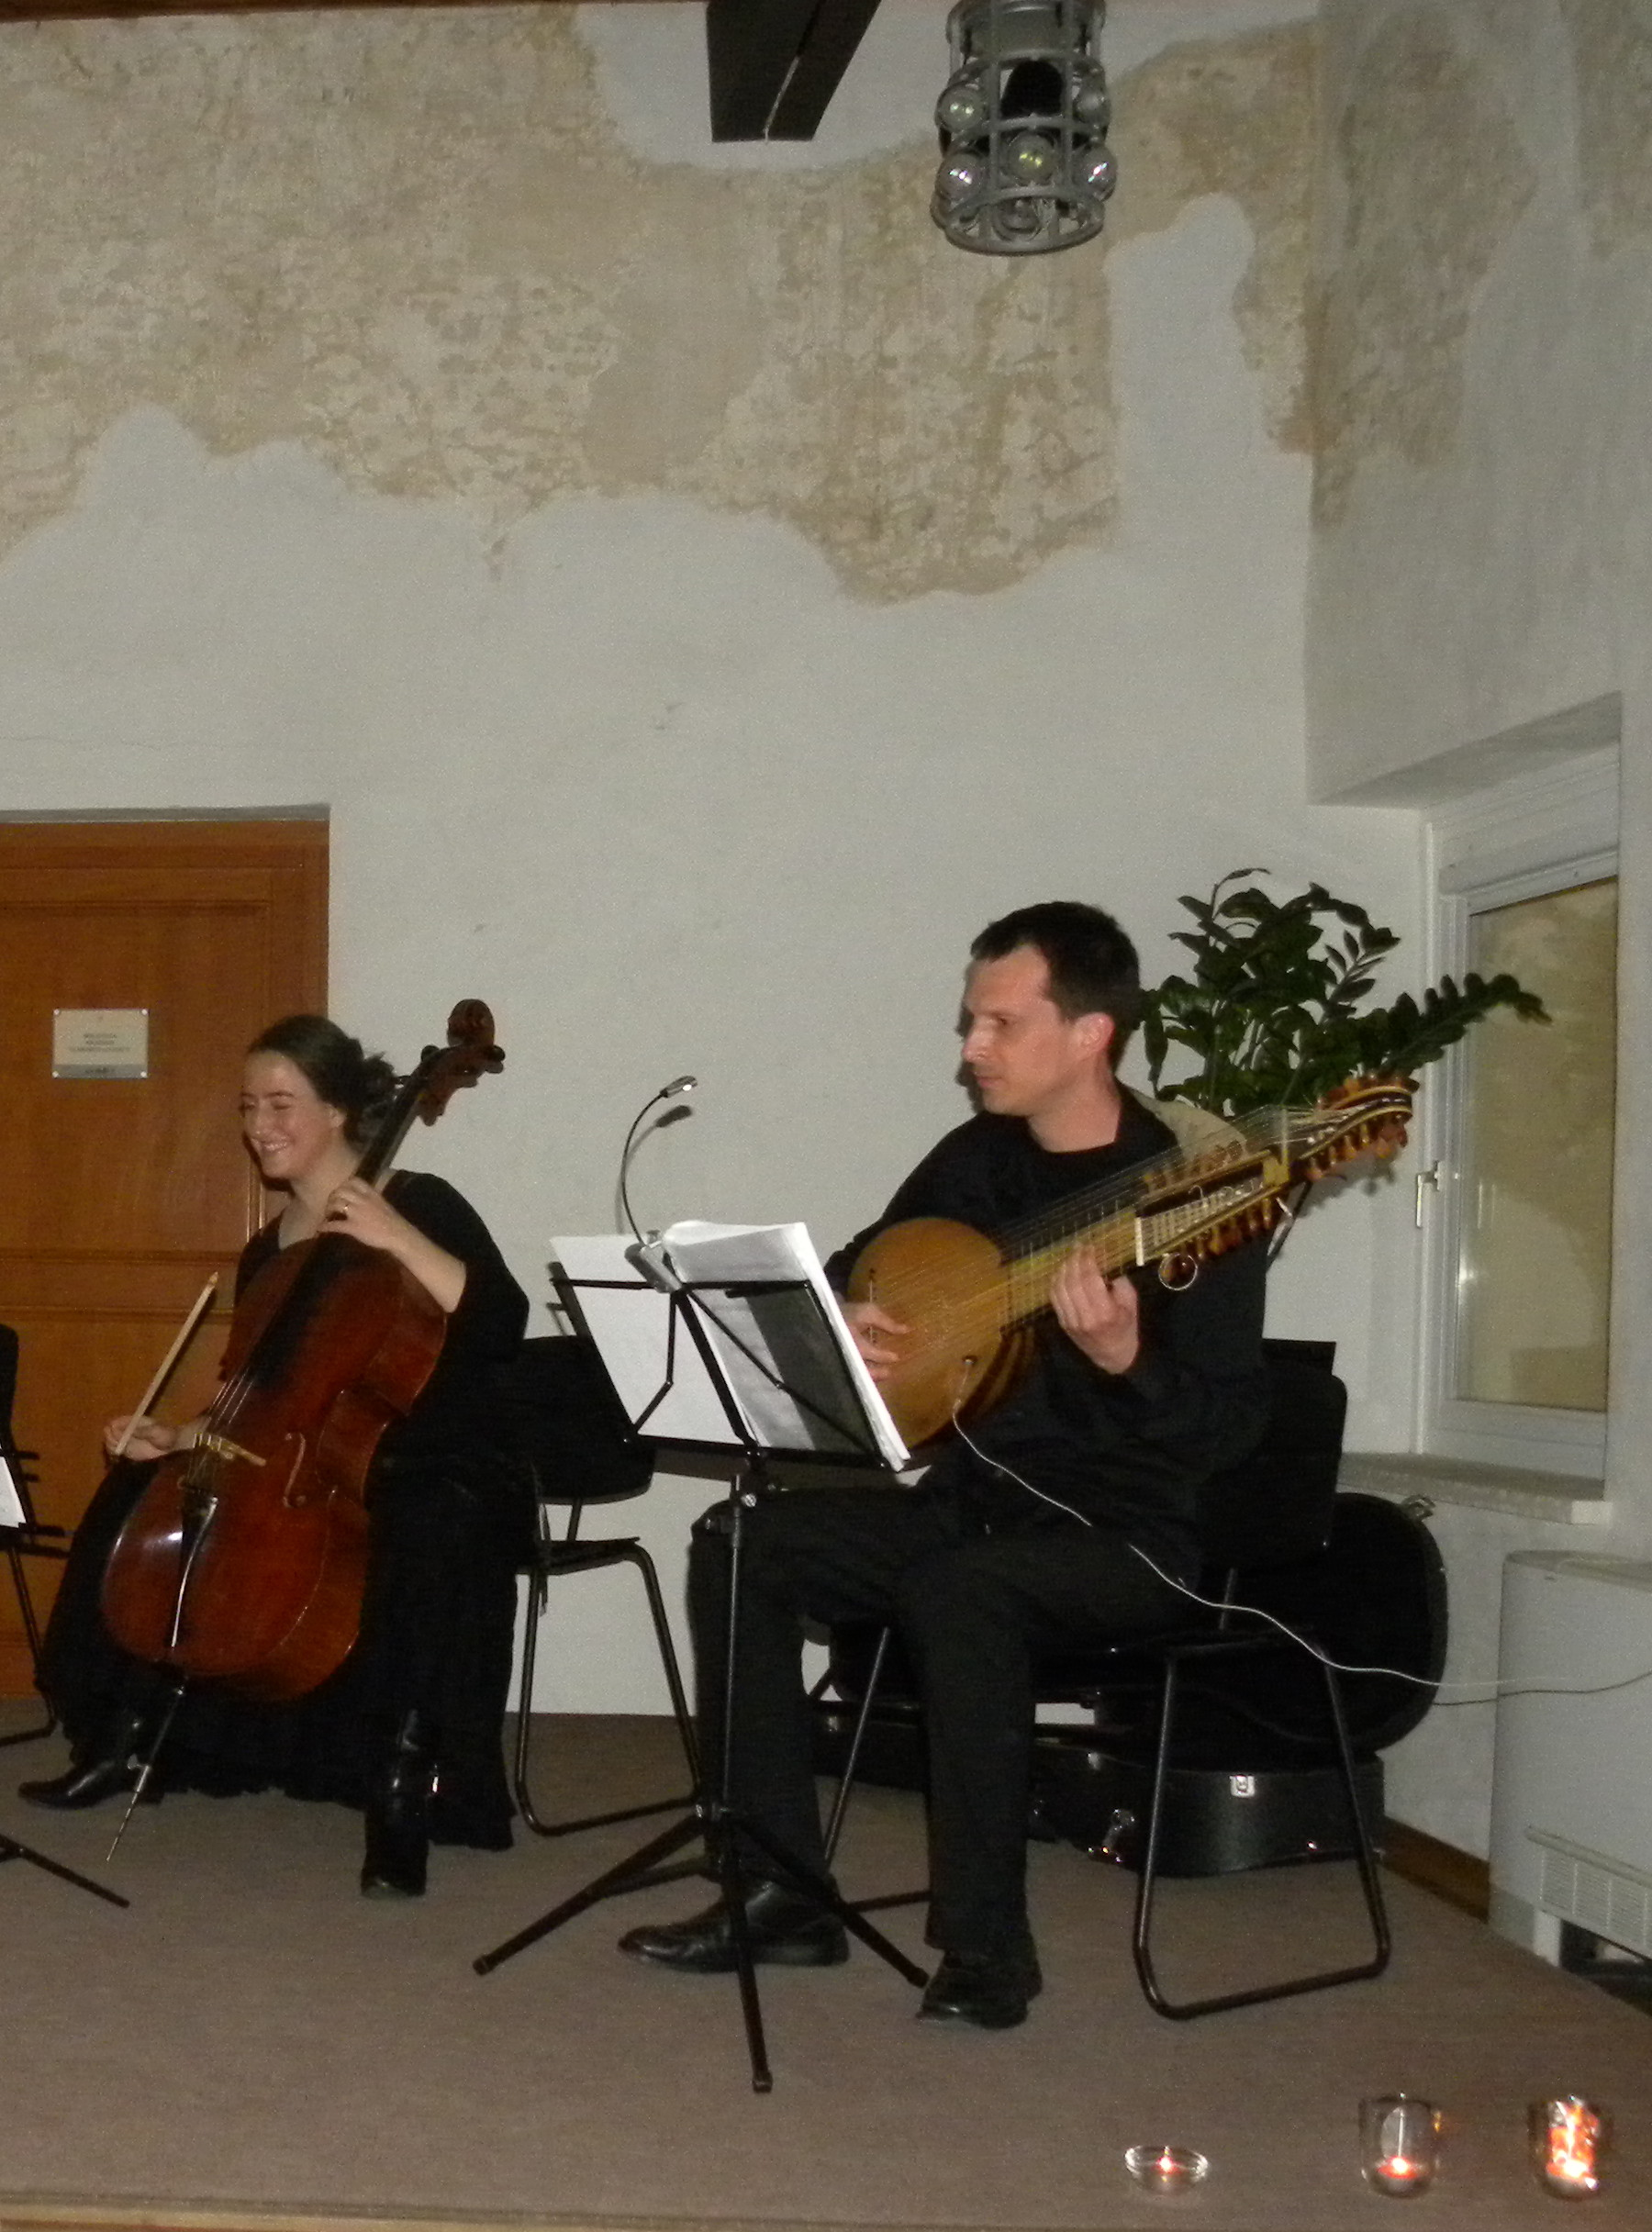 CONCERT/Concerto 23/04/16 20 PM